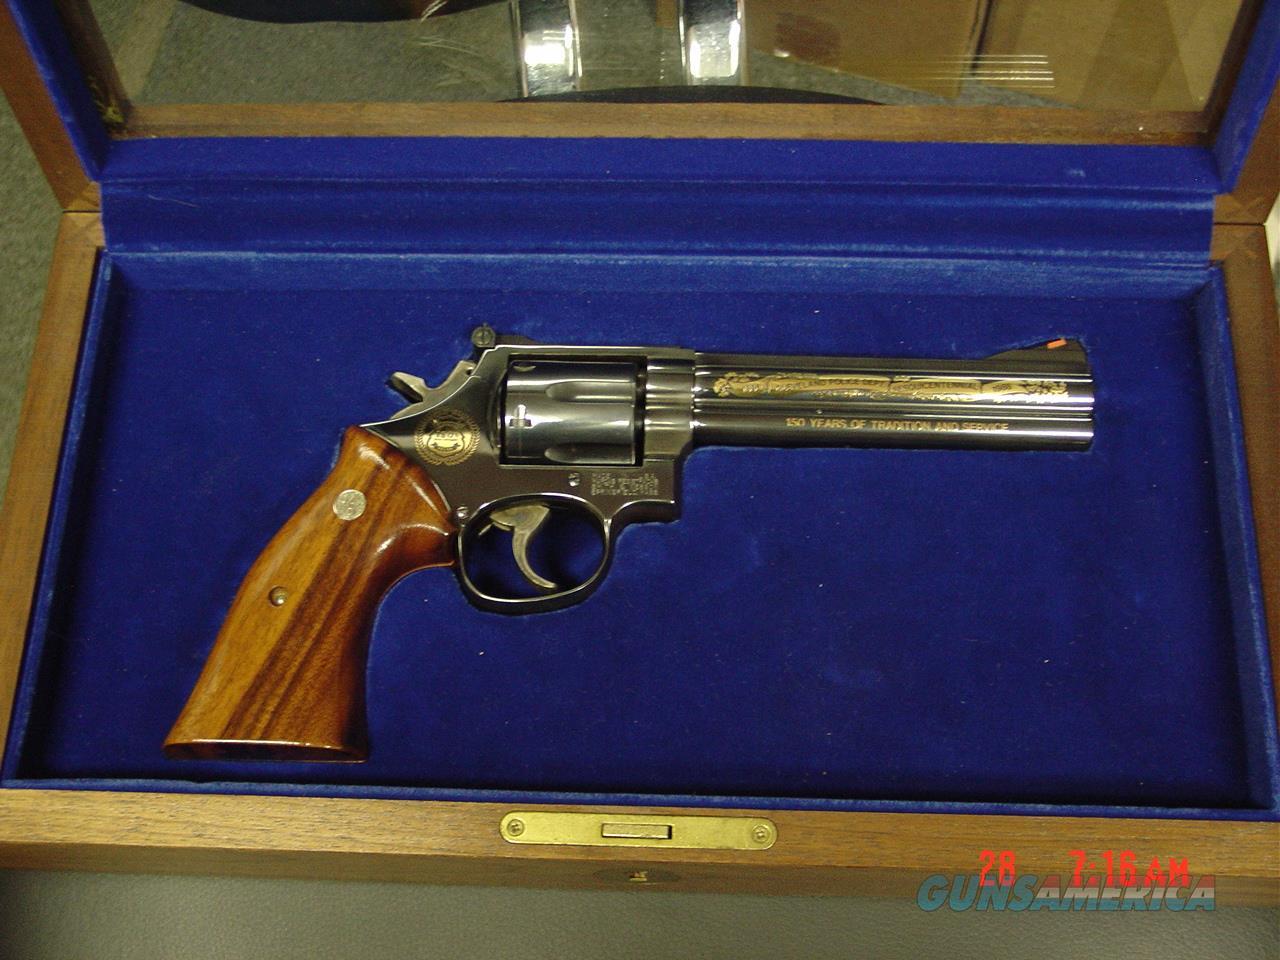 "Smith & Wesson 586 no dash,blue,6"" Cleveland Police Dept.Comm.,24K gold engraved,1986,wood grips,pres case, 357 magnum,#460 of 500 !  Guns > Pistols > Smith & Wesson Revolvers > Full Frame Revolver"